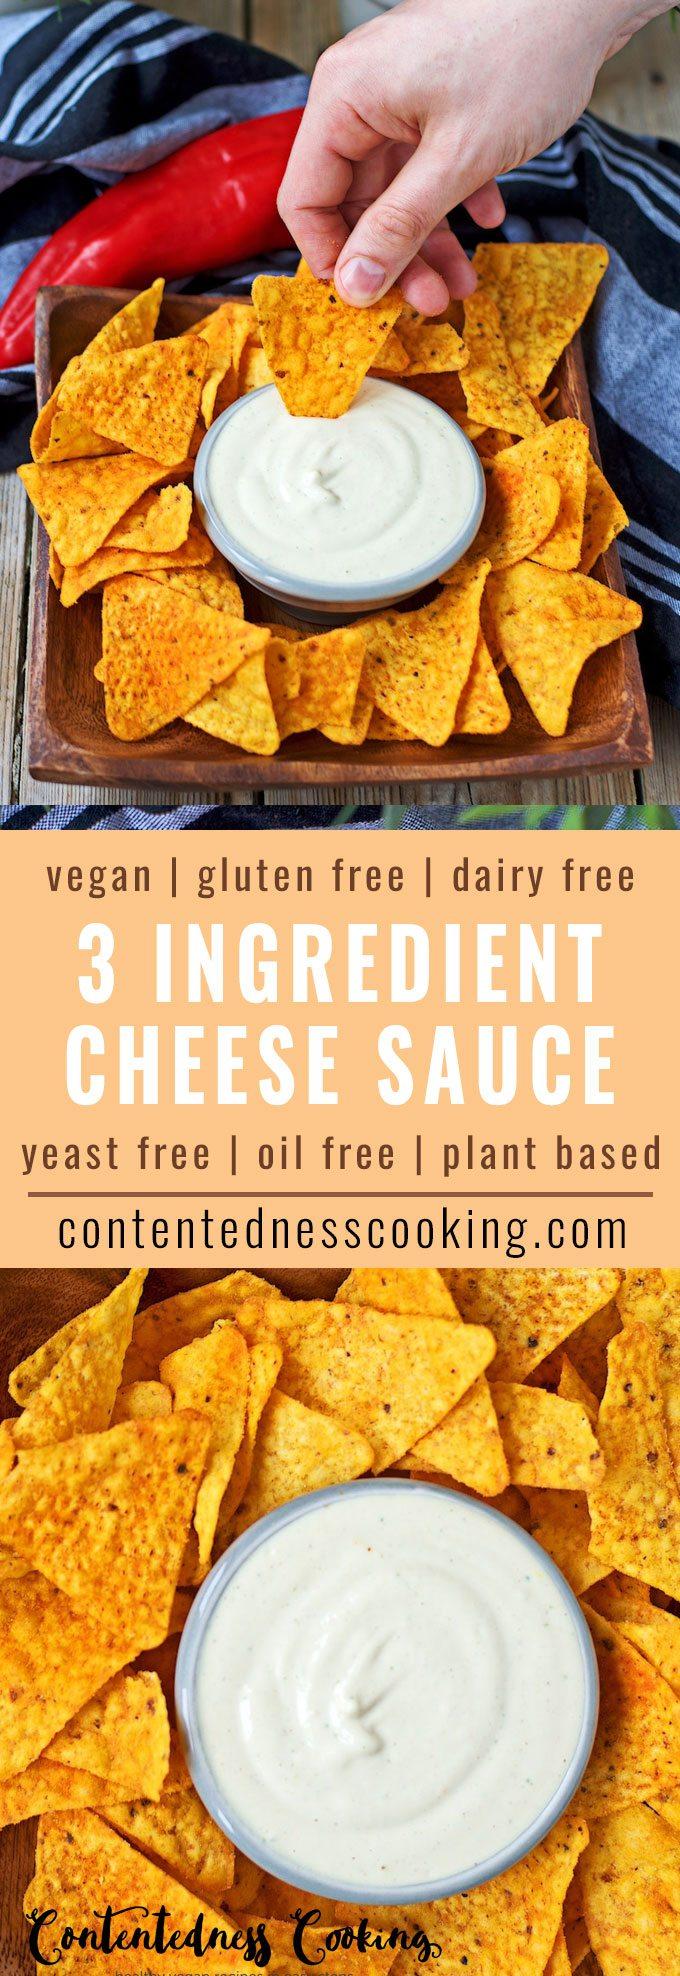 Vegan Cheese Sauce   #vegan #glutenfree #contentednesscooking #plantbased #dairyfree